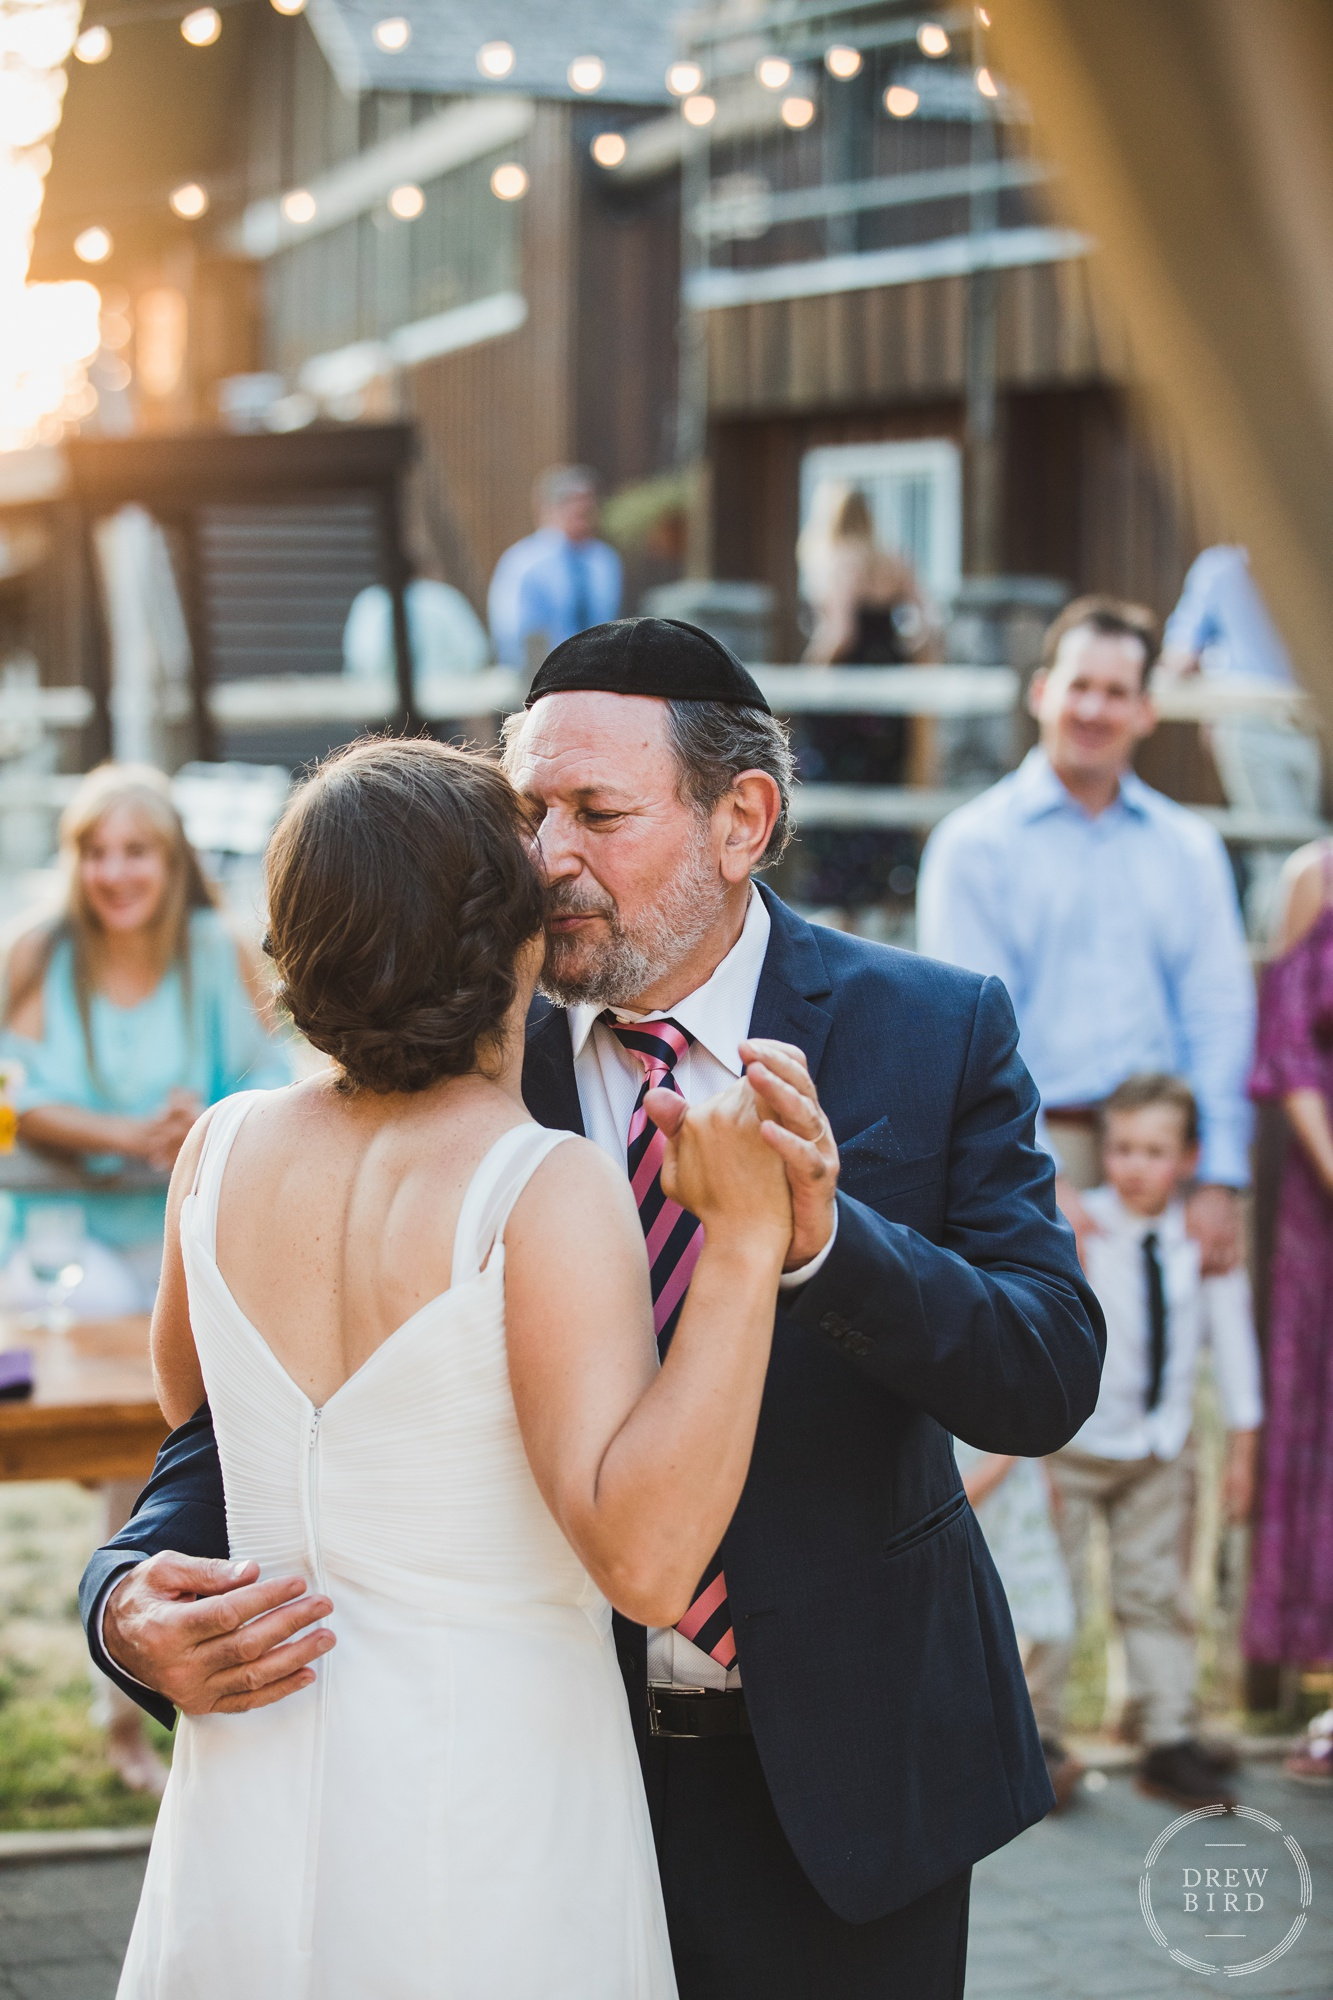 Mt. Hood Ski Bowl Wedding  Ski Bowl Warming Hut Wedding Ceremony  Lori Ann & Kieran's Mt. Hood Destination Wedding Photography  Drew Bird Photography San Francisco Wedding Photojournalism Have Camera. Will Travel. www.drewbirdphoto.com